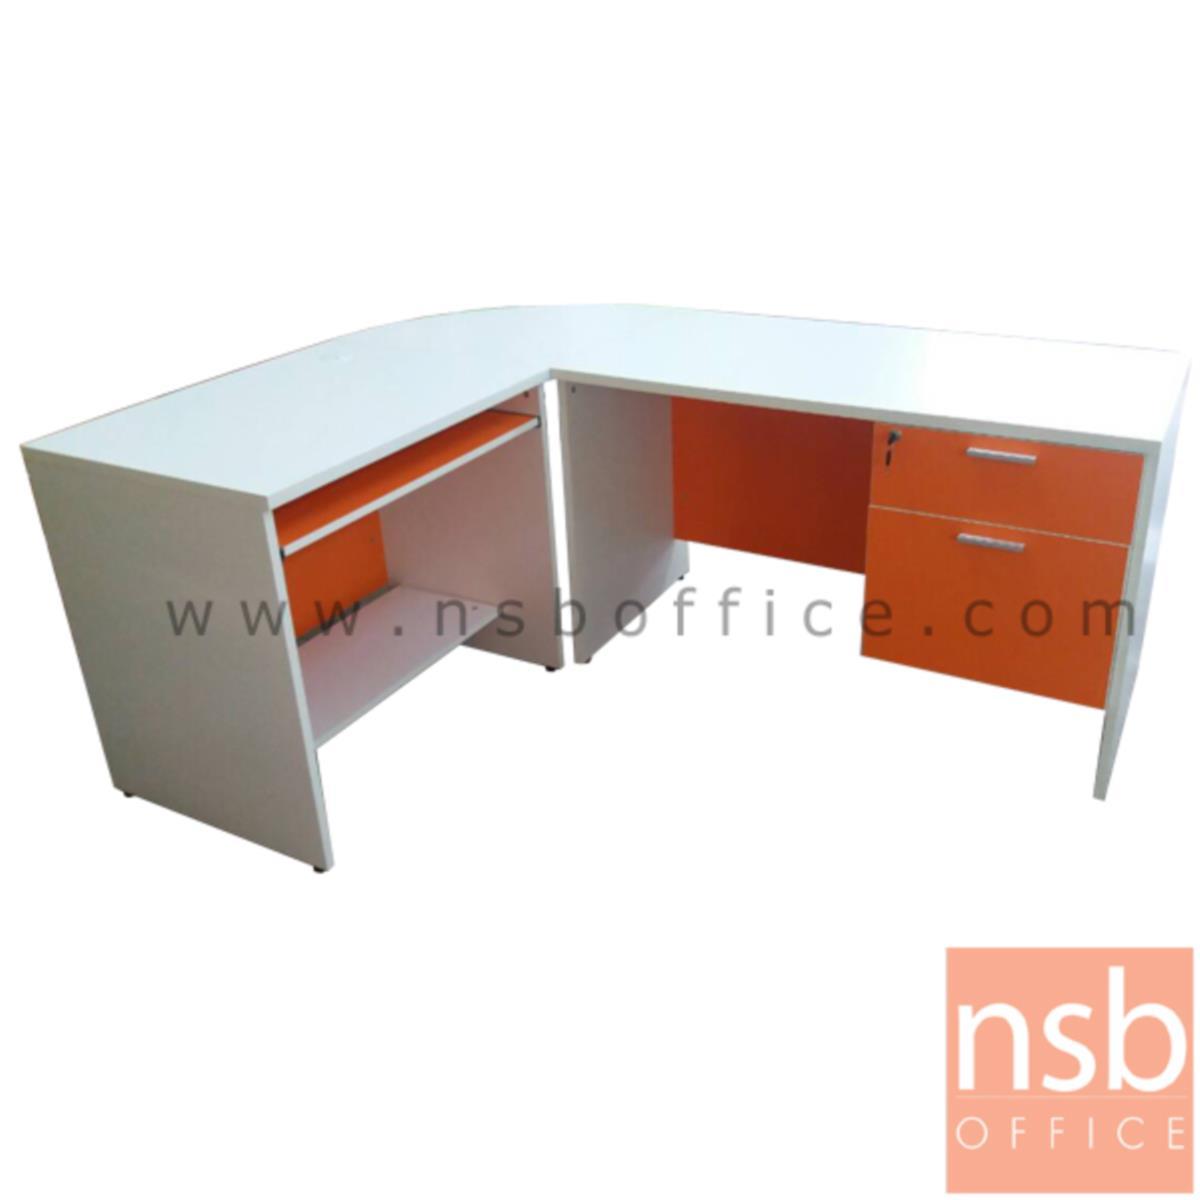 A20A015:ชุดโต๊ะทำงานตัวแอลสีสัน  รุ่น MT-TABLE-L  ขนาด 180W cm.